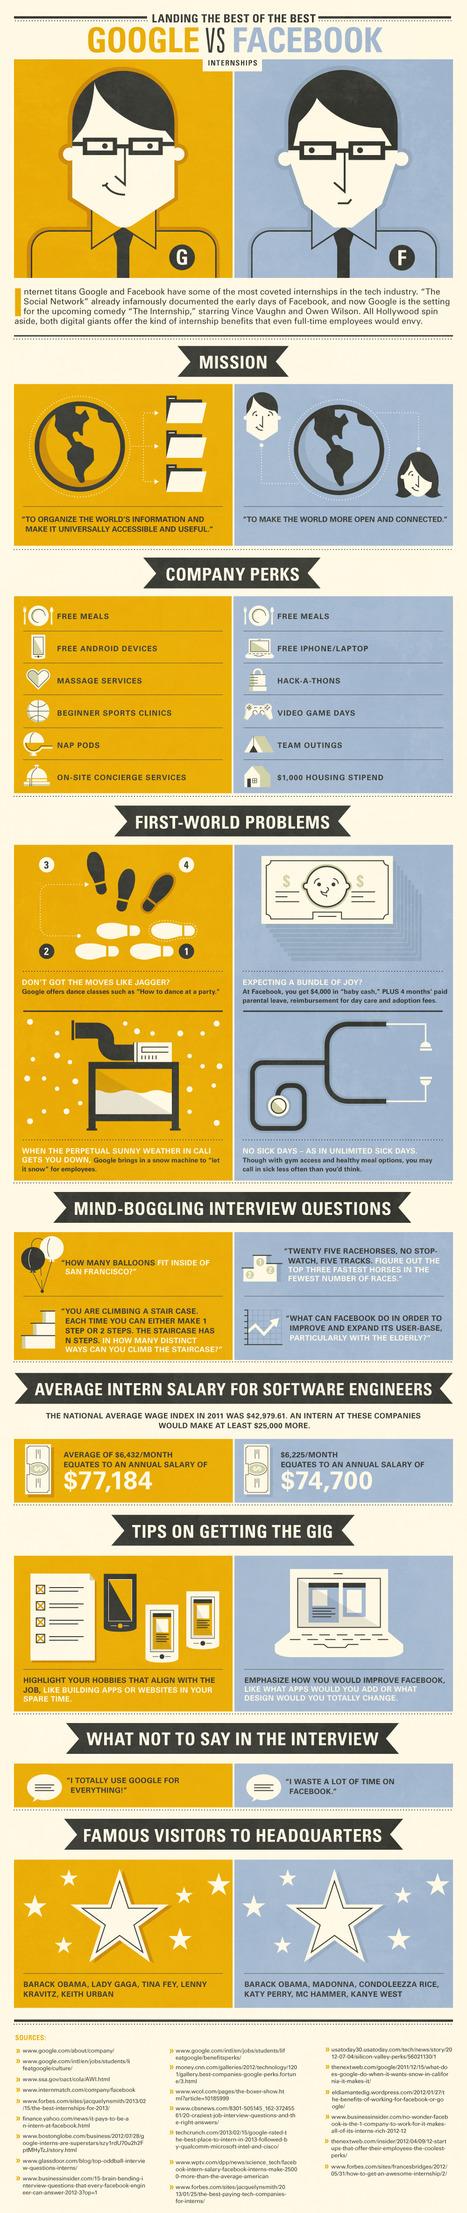 Google vs. Facebook Internships #infographic | Rwanda News | Scoop.it